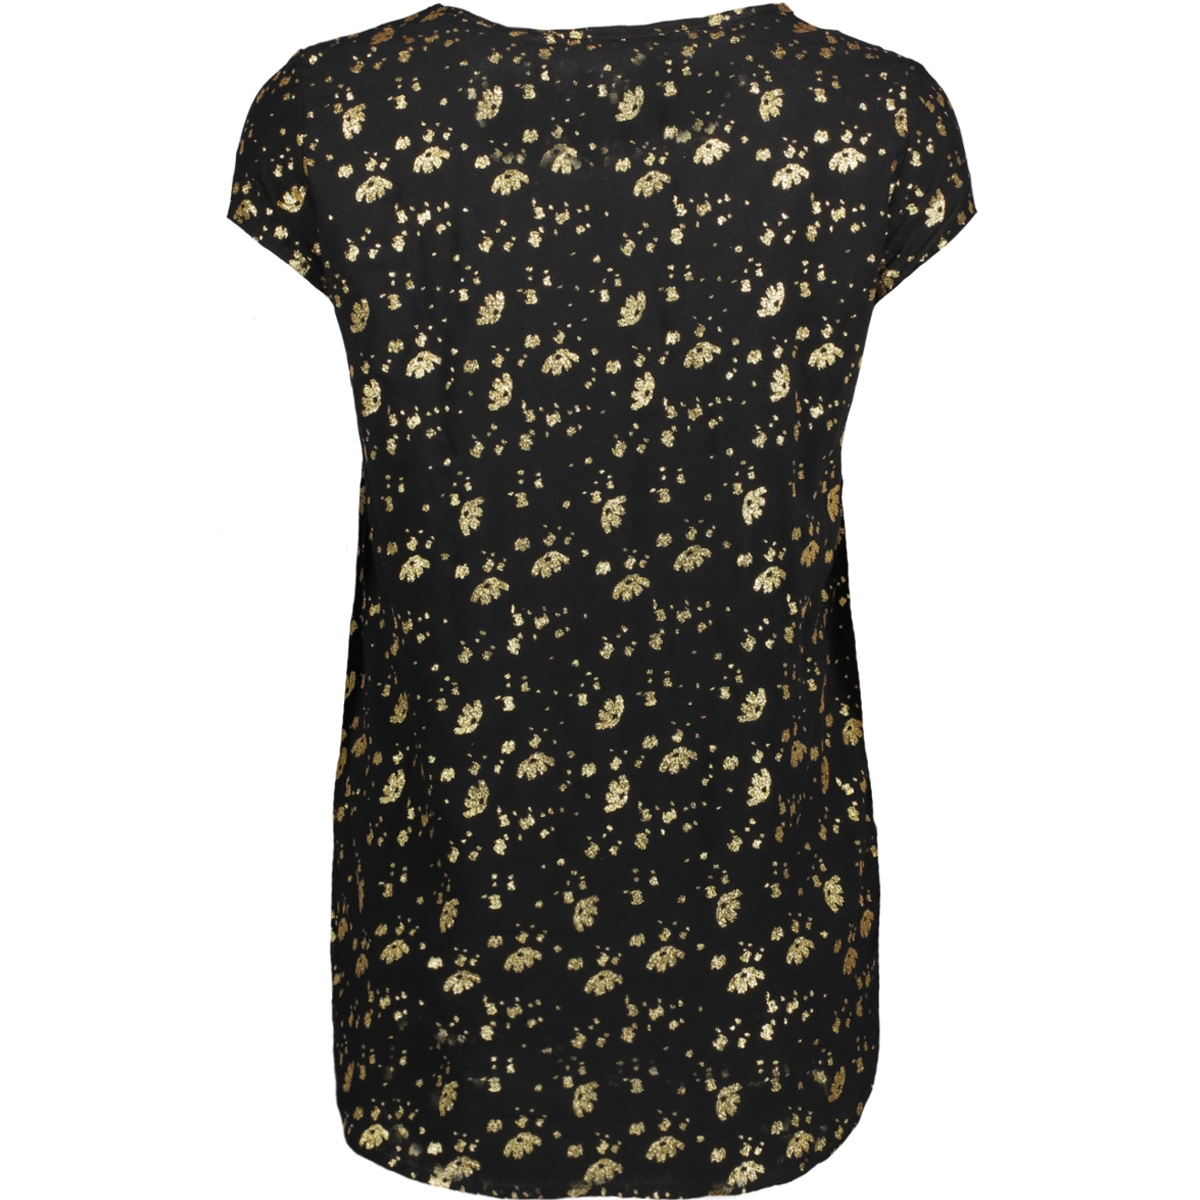 vmboca ss blouse foil aop print 10178397 vero moda t-shirt black/flowers